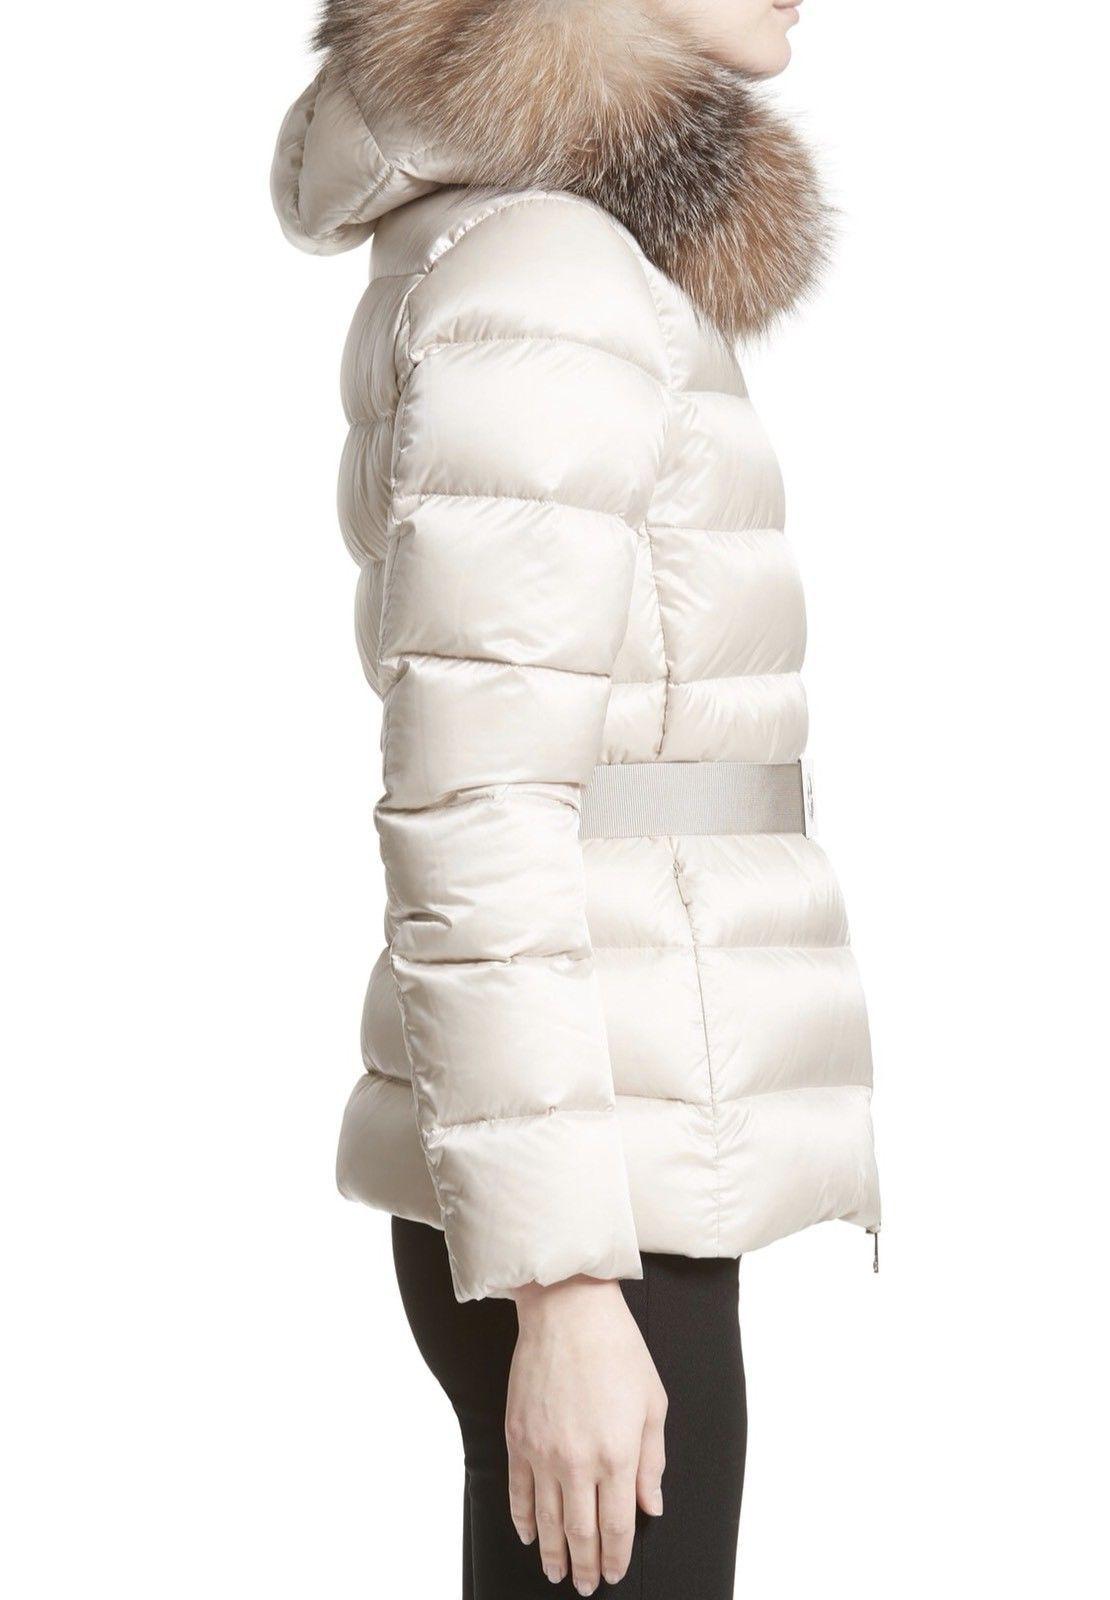 Details about Moncler Authentic Tatie Fox Fur Trim Hooded Short Down Puffer Coat New Black 2